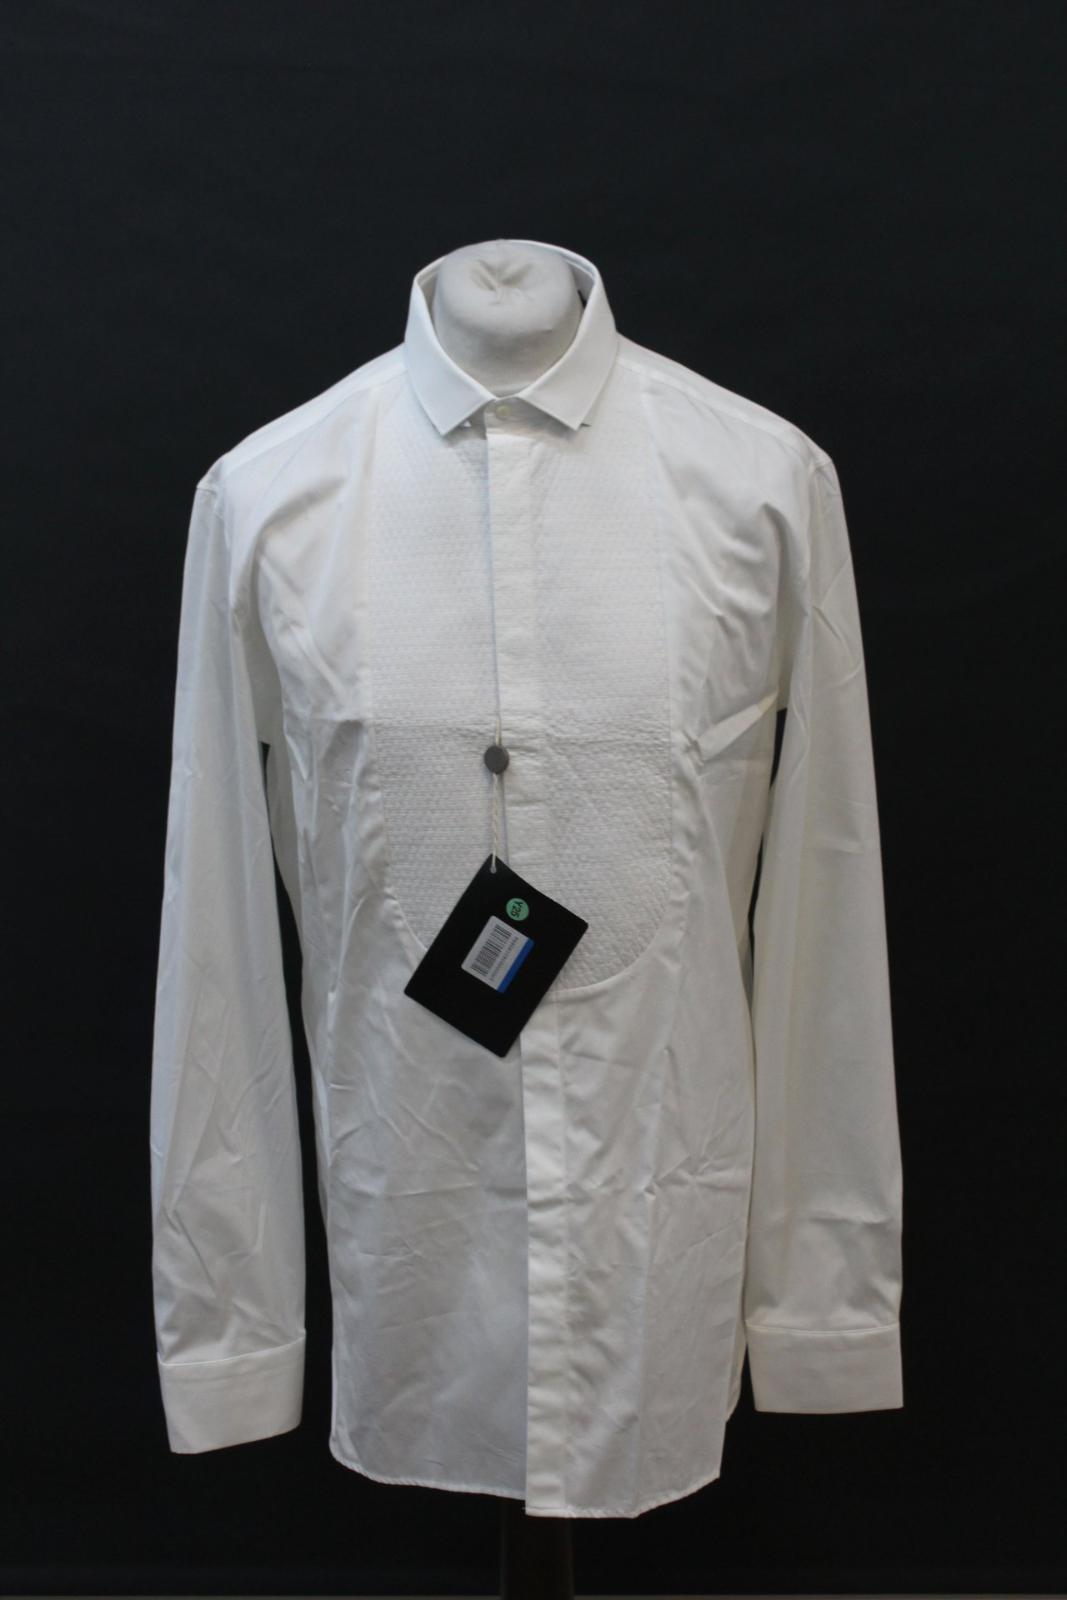 Neil-Barrett-Hombre-Blanco-De-Algodon-Manga-Larga-Camiseta-Formal-Cuello-17-034-43cm-BNWT miniatura 2